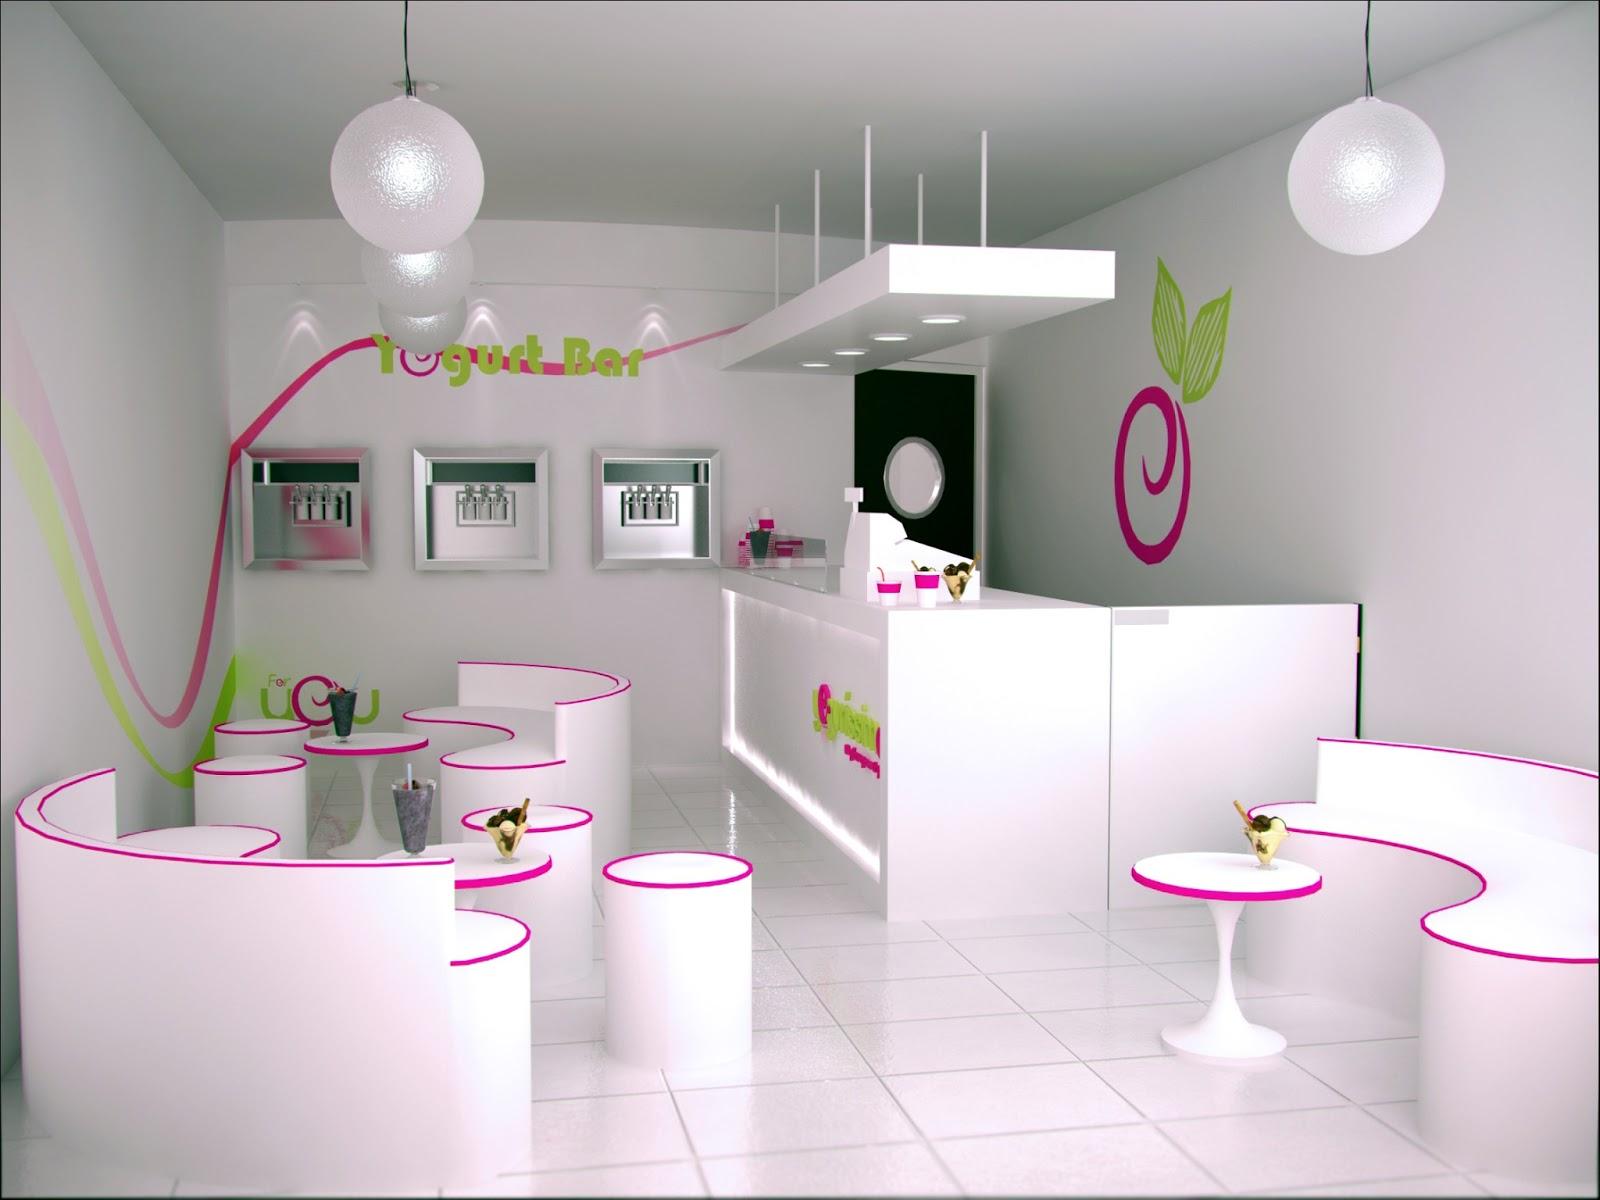 Dise o interior local comercial yogurissimo for Imagenes de diseno de interiores